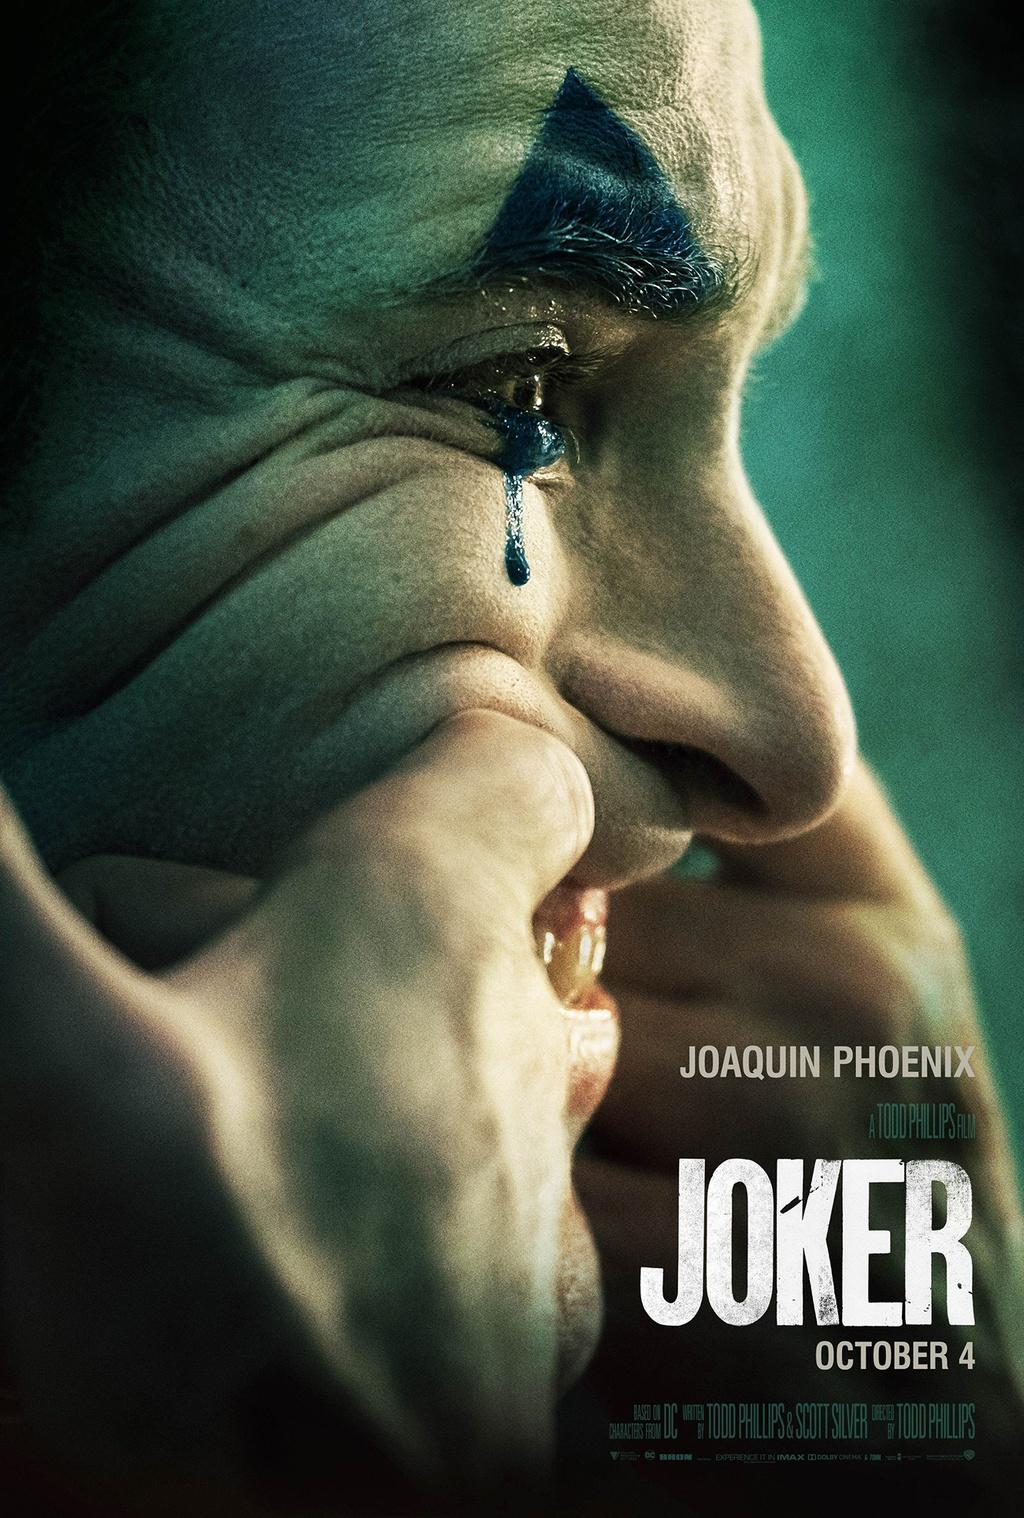 'Joker' - cau chuyen den toi ve ga he dien o thanh pho Gotham hinh anh 1